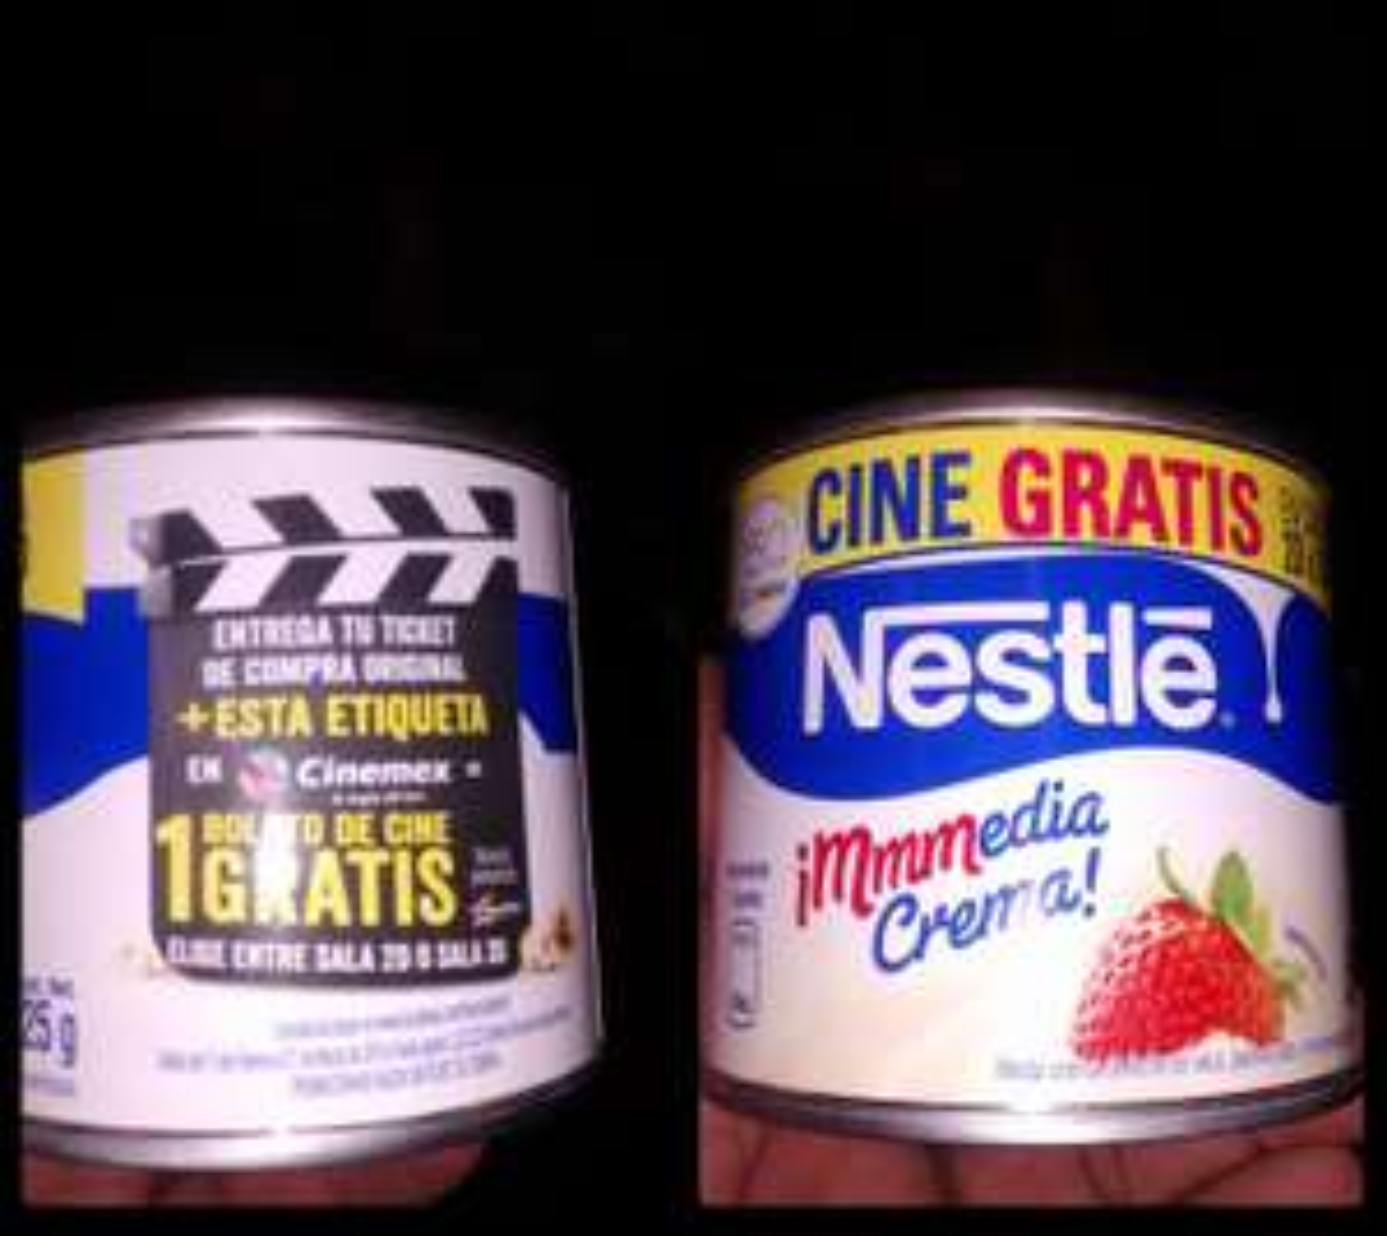 Boleto de Cinemex 2D o 3D GRATIS comprando media crema Nestle